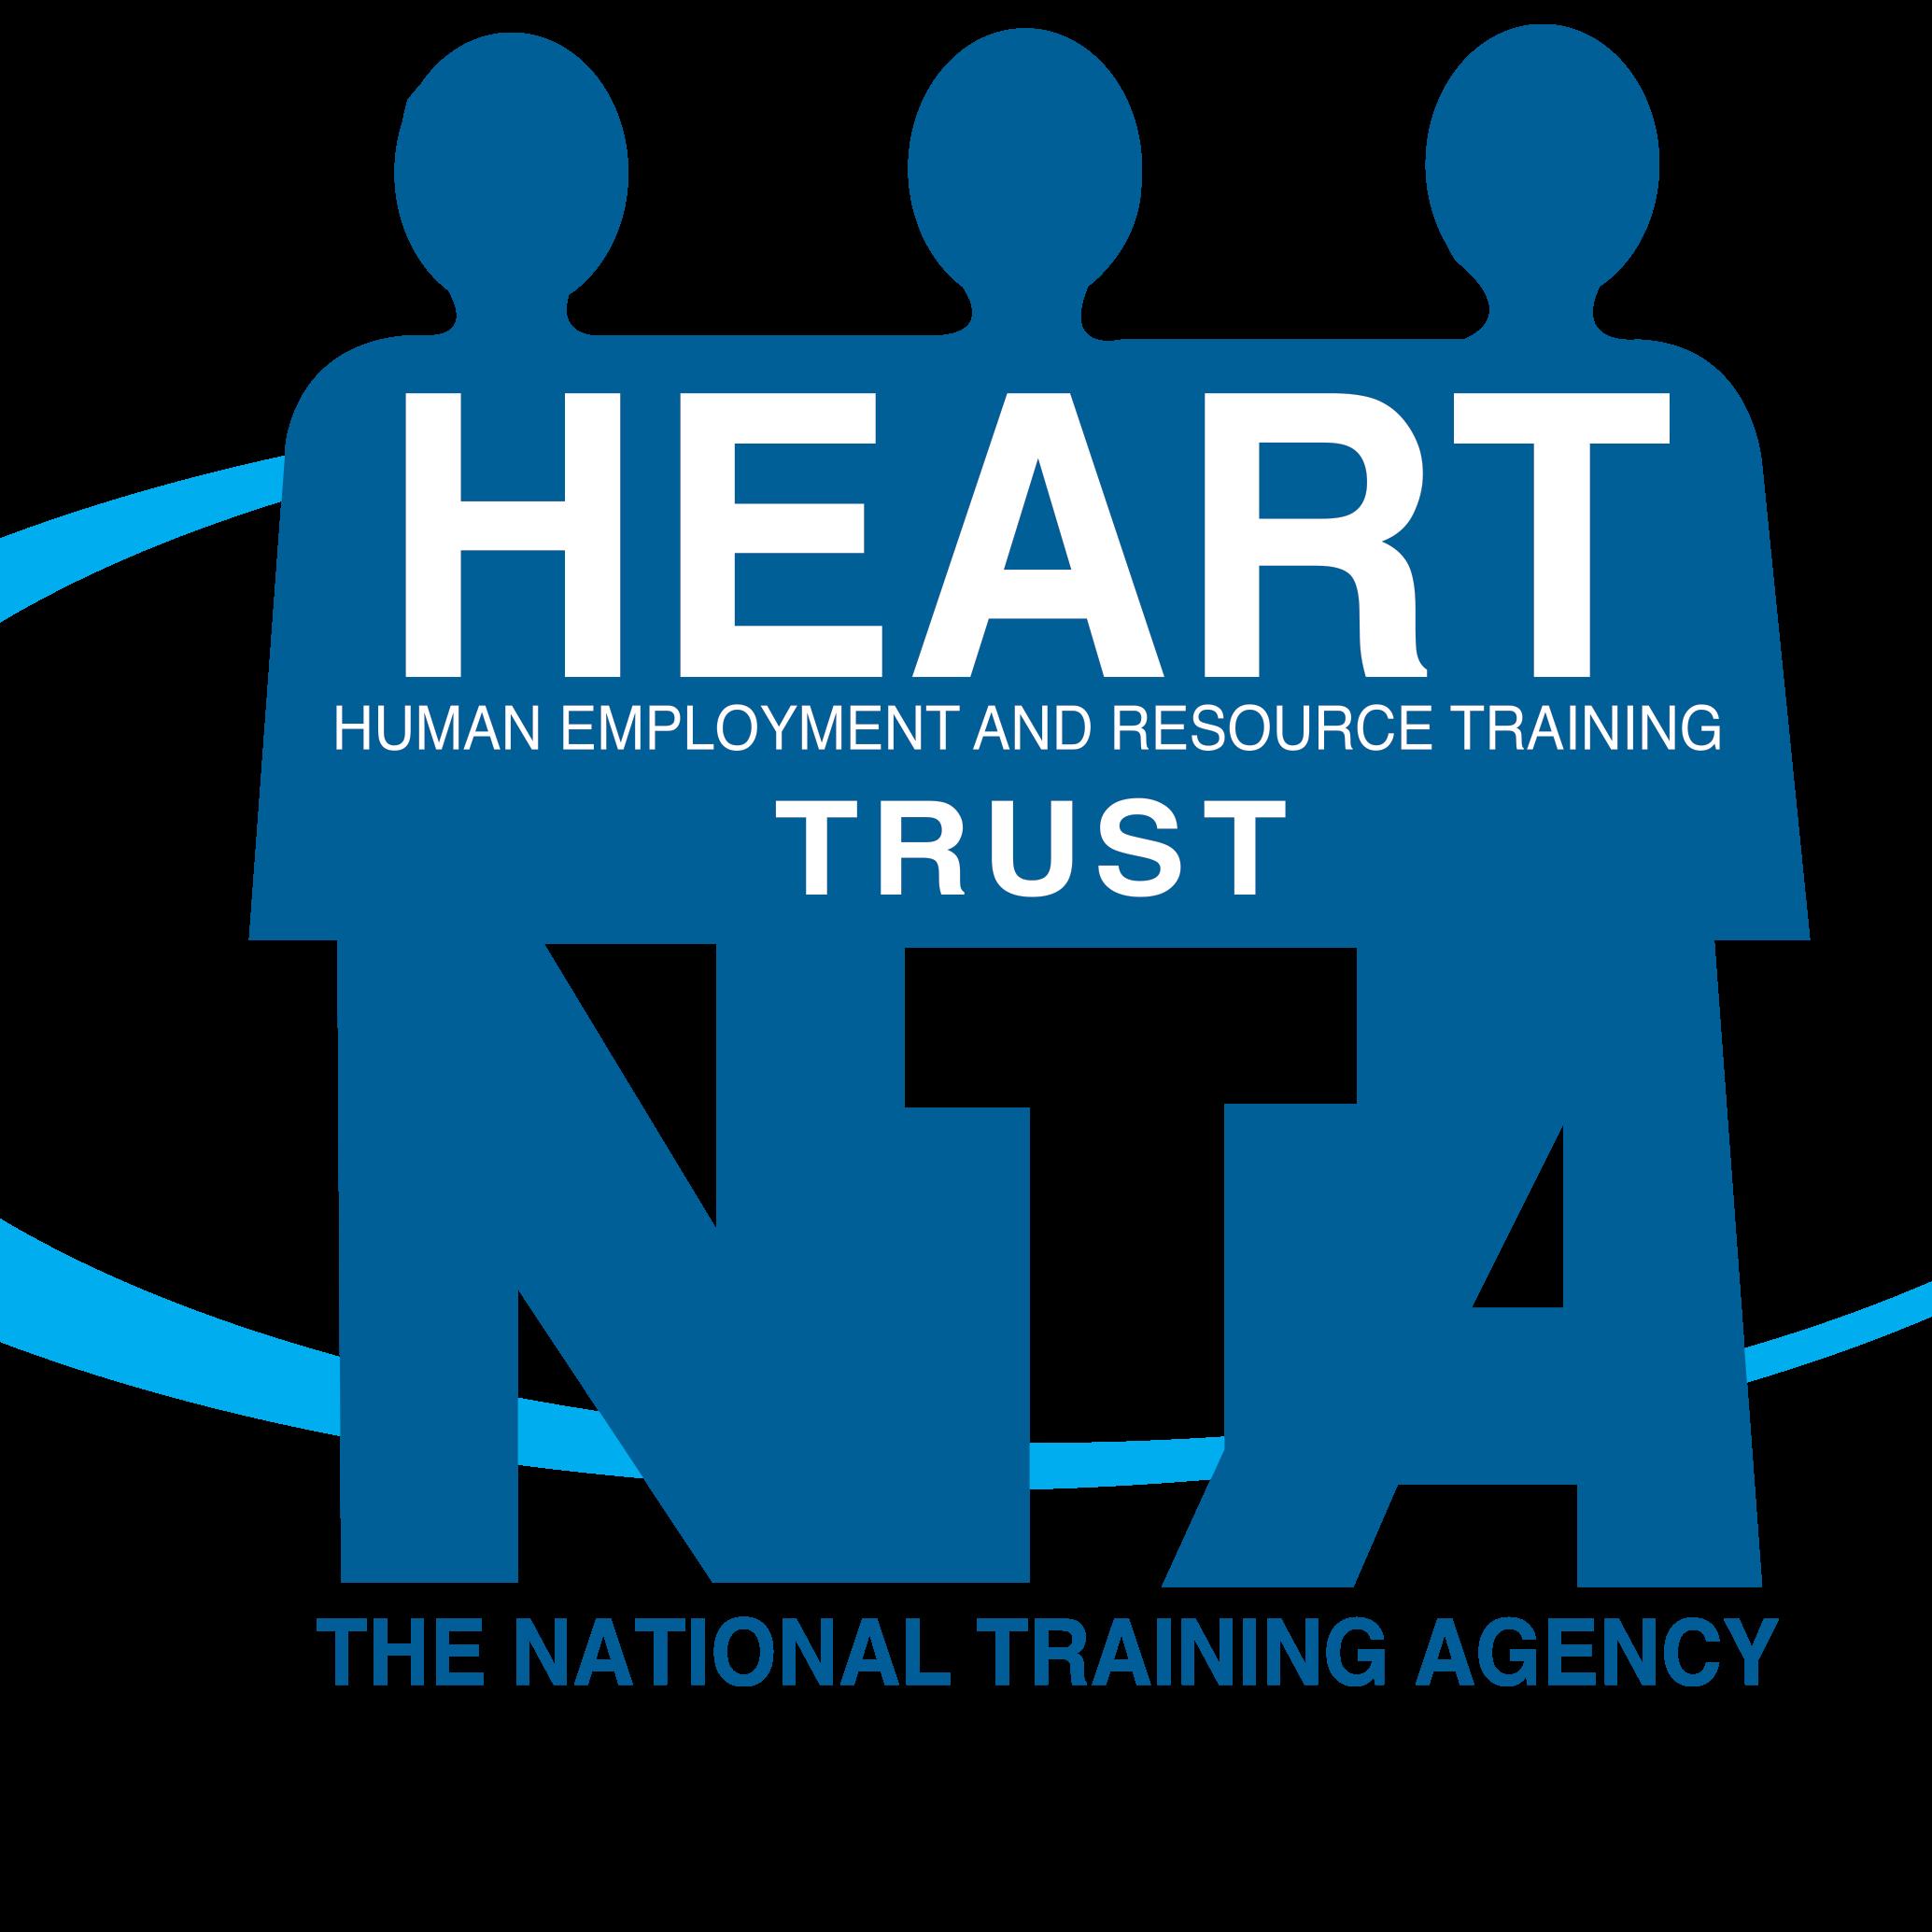 Heart-Foundation-of-Jamaica-WL1H.jpg